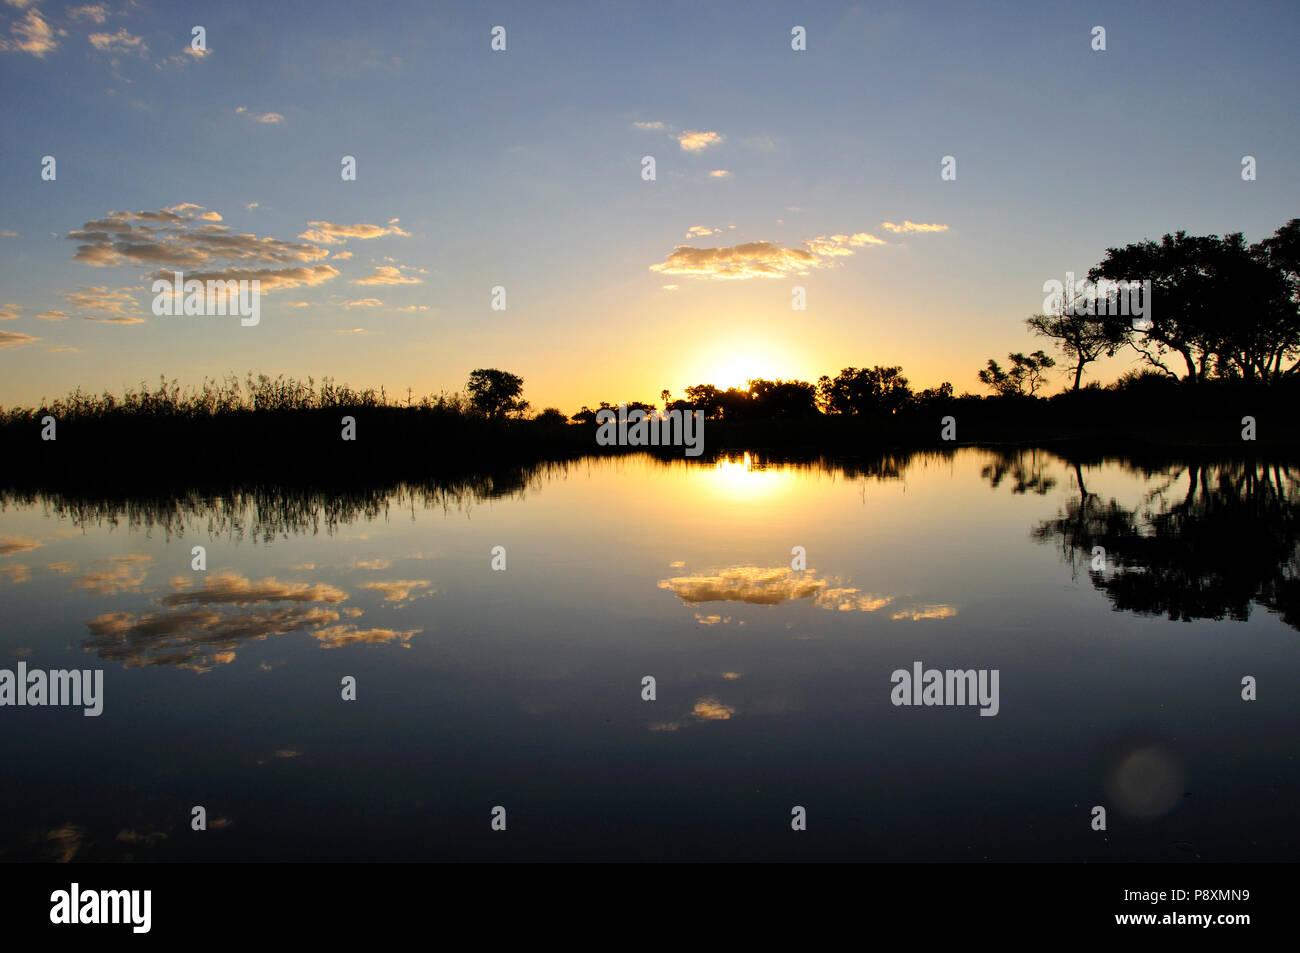 Botswana: Sunset in the flooded Okavango-Delta-swamps in the middle of the central Kalahari desert - Stock Image